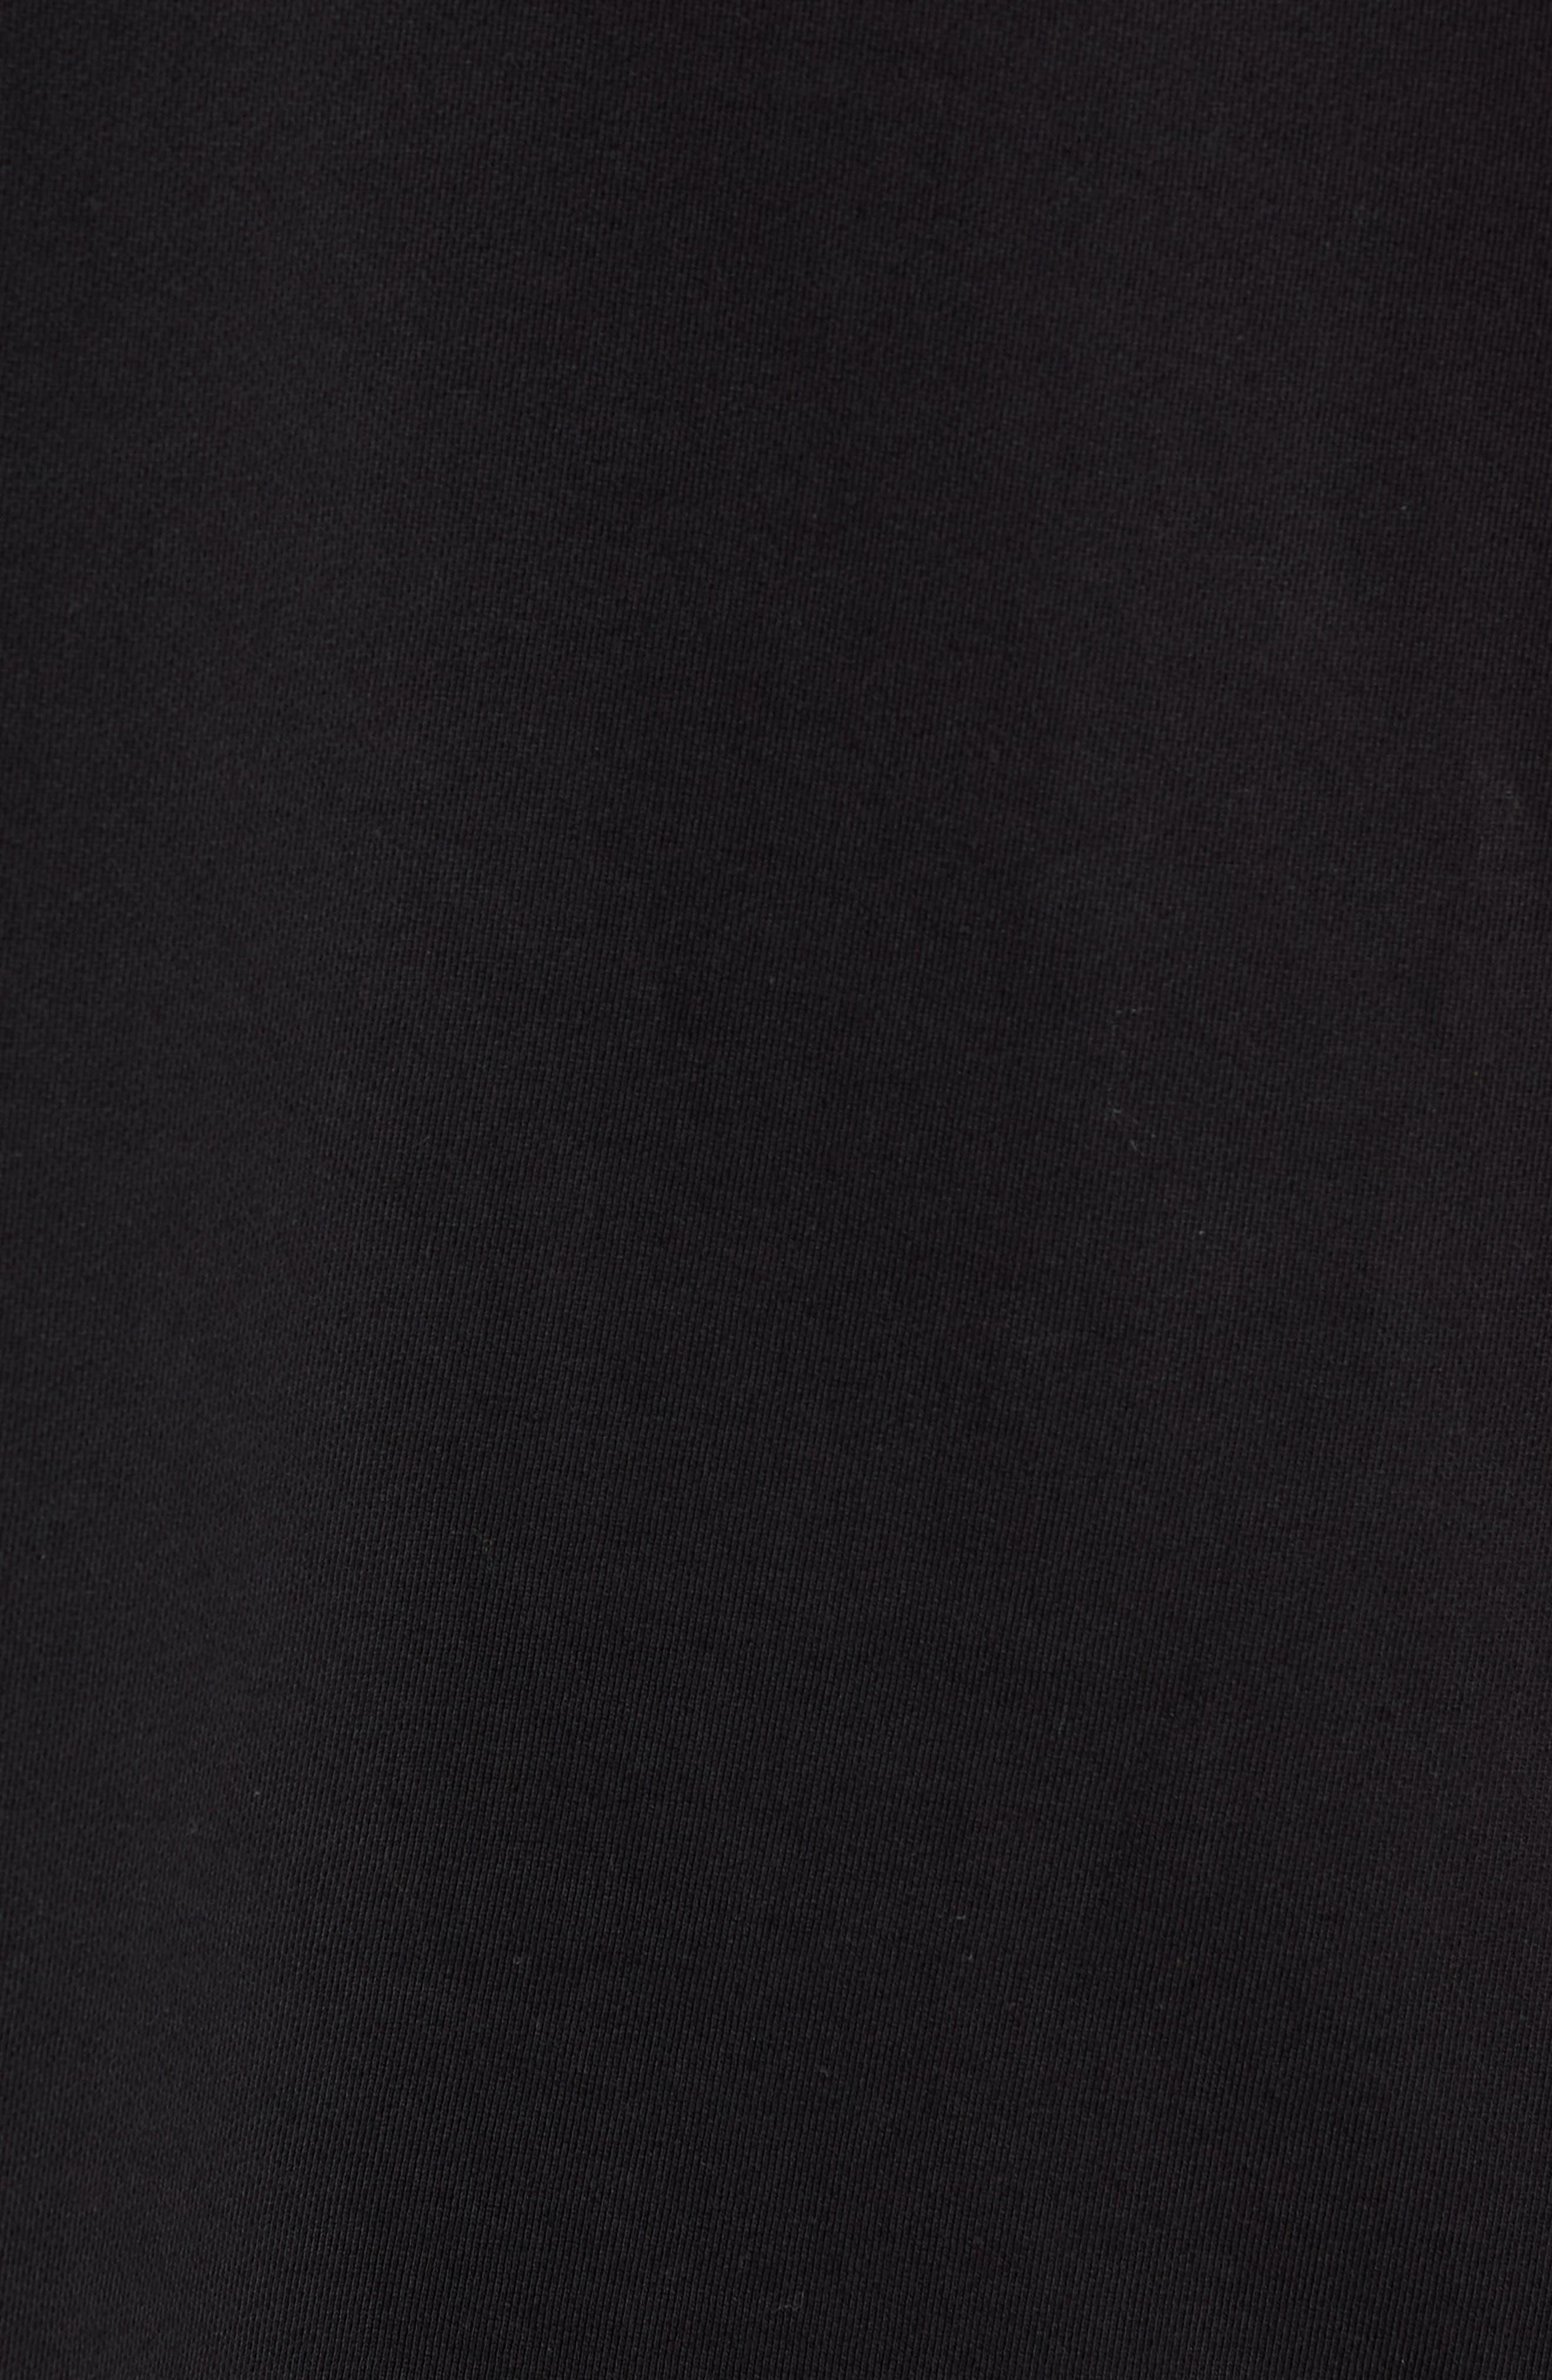 S-DRIVE-LS-XA Embroidered Hooded Sweatshirt,                             Alternate thumbnail 5, color,                             BLACK